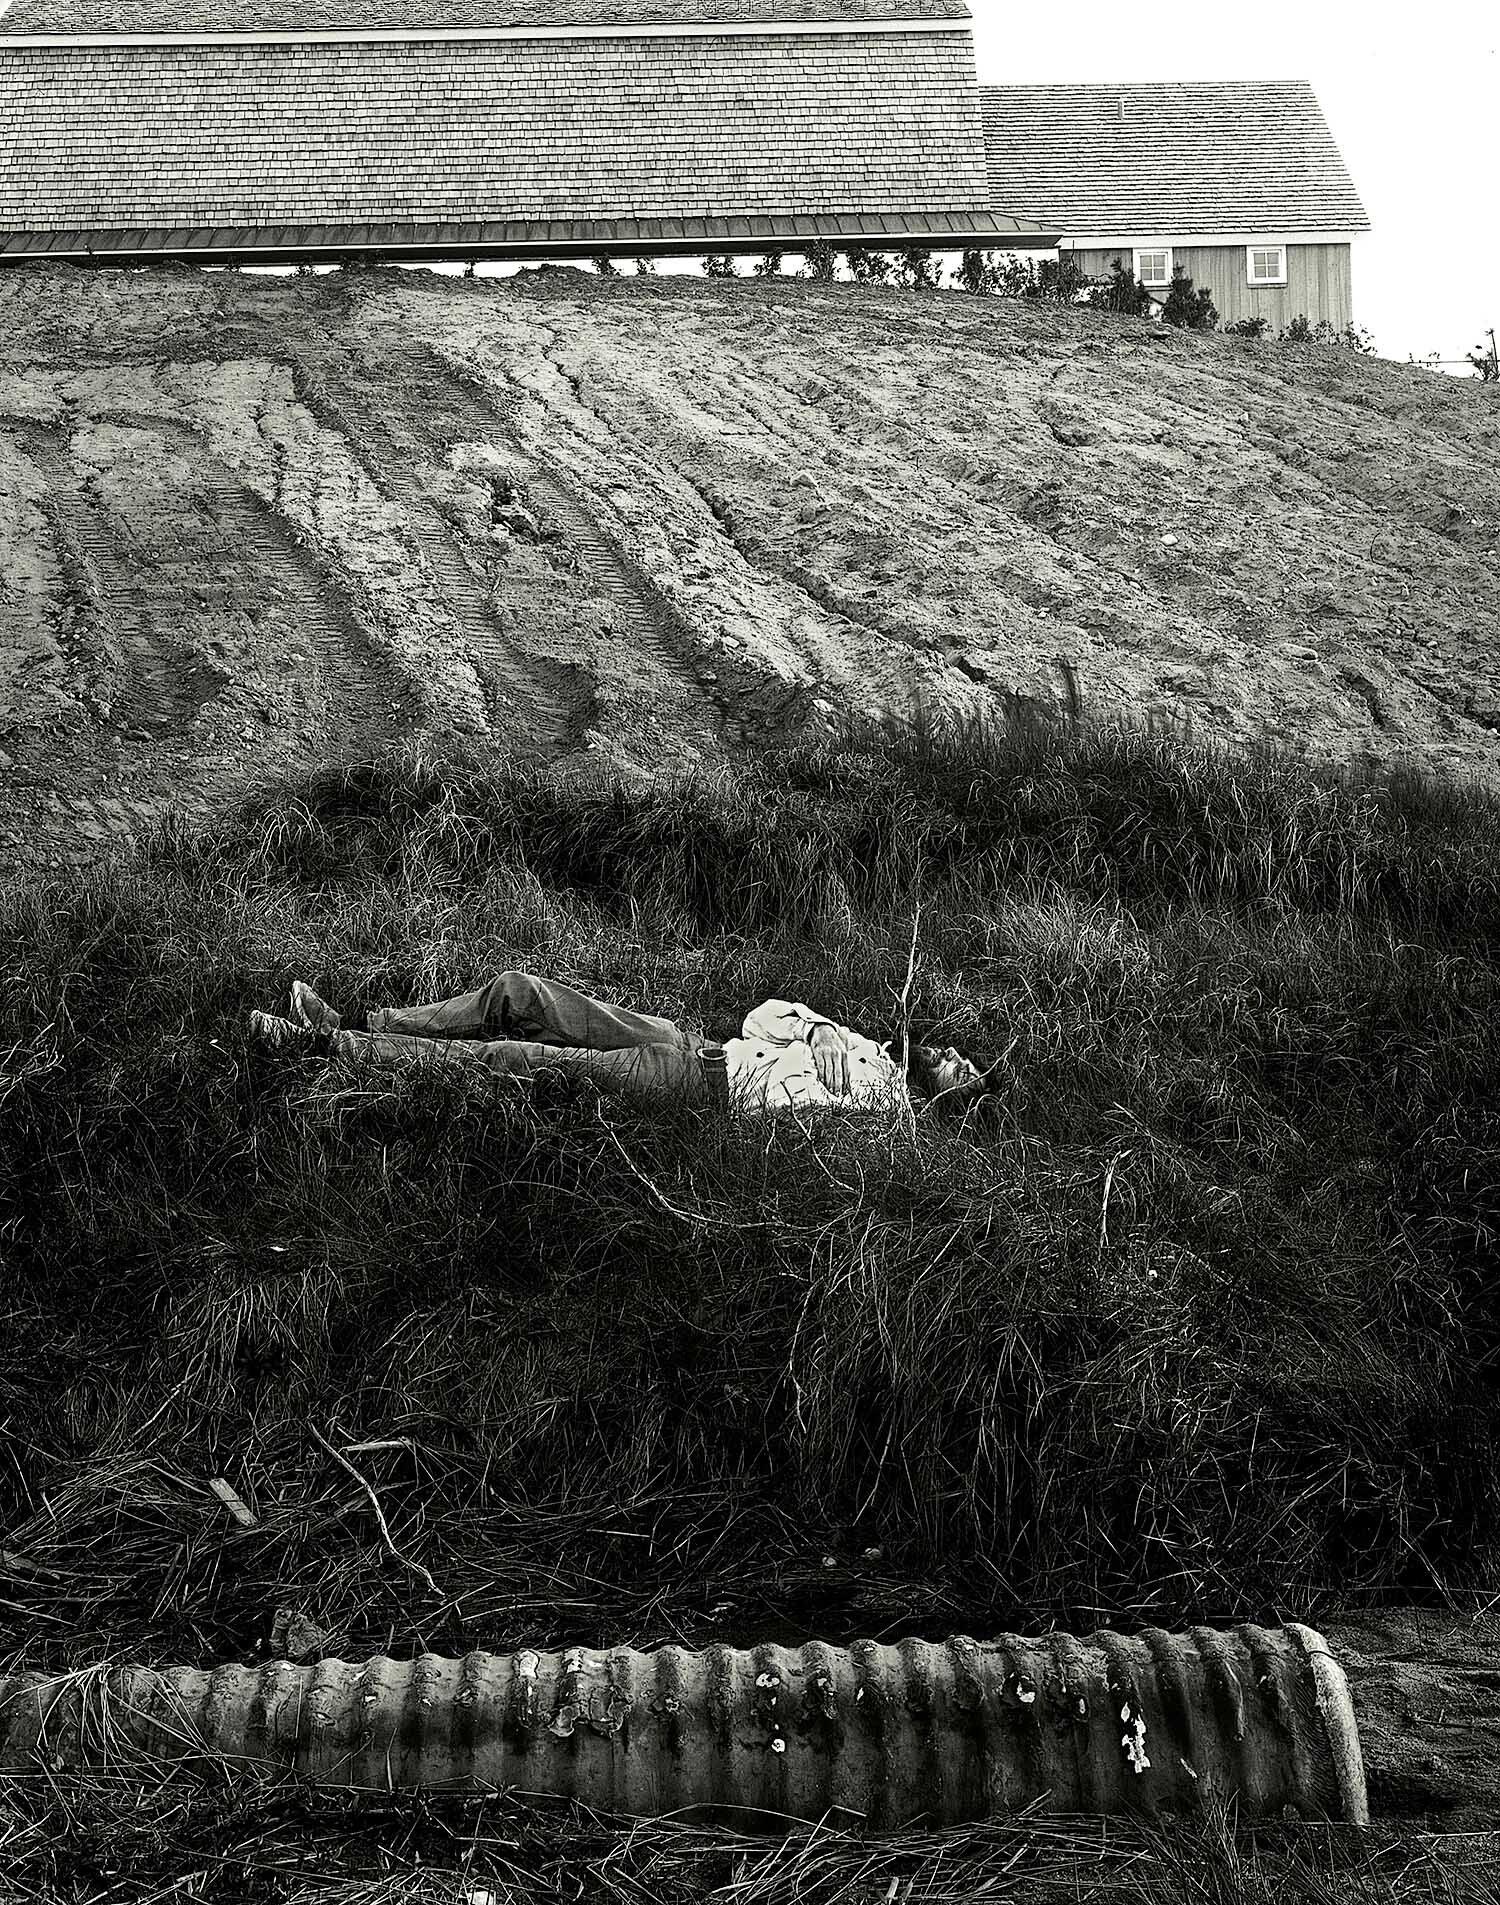 Self Portrait, Montauk Point, 1970